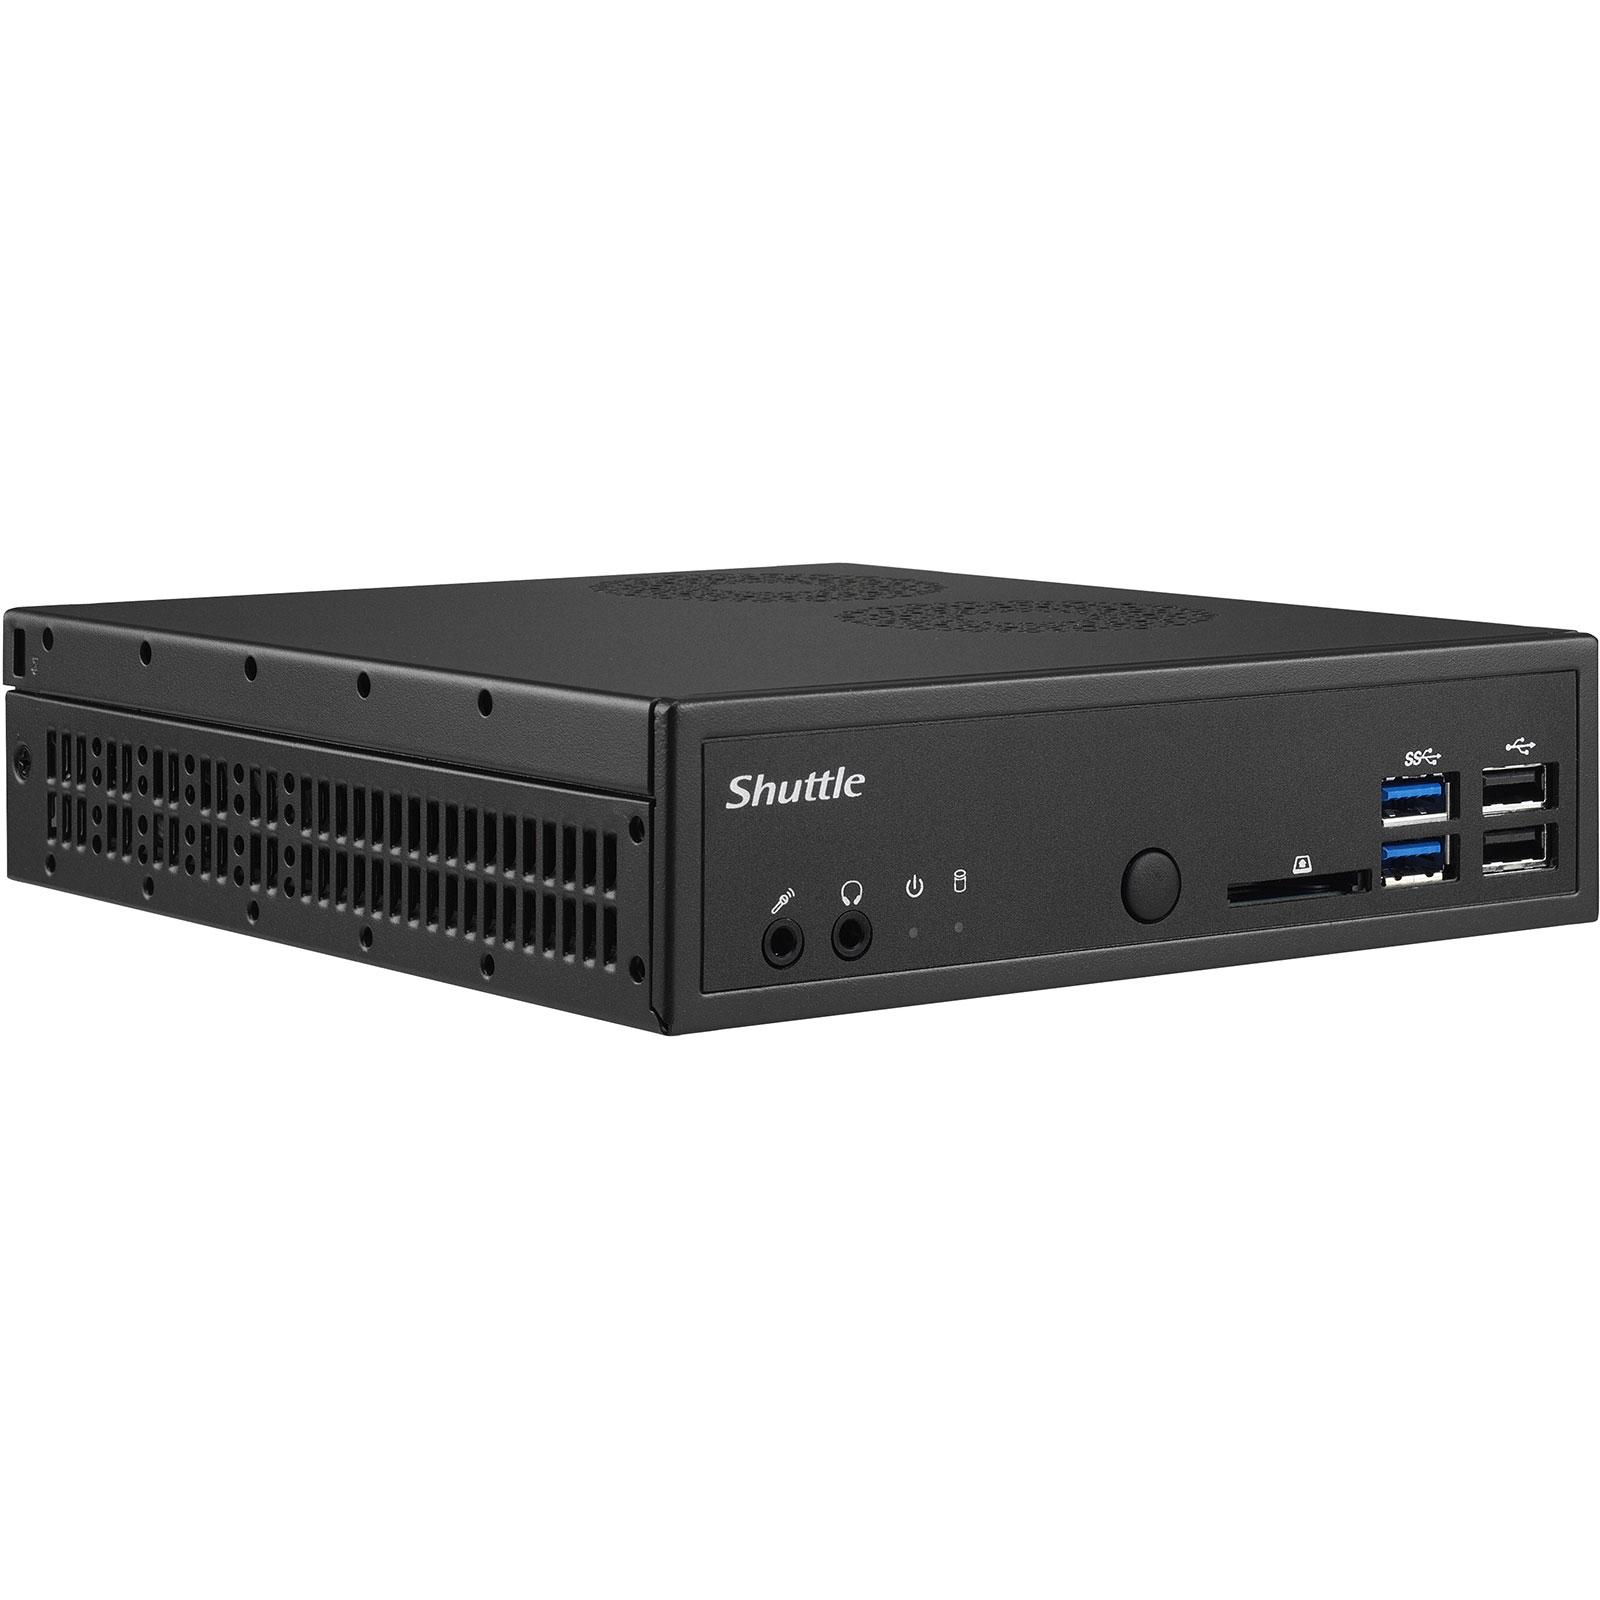 Barebone PC Shuttle XPC Slim DH310 Mini-Barebone - 90W (Intel H310 Express) (sans processeur/mémoire/disque dur)